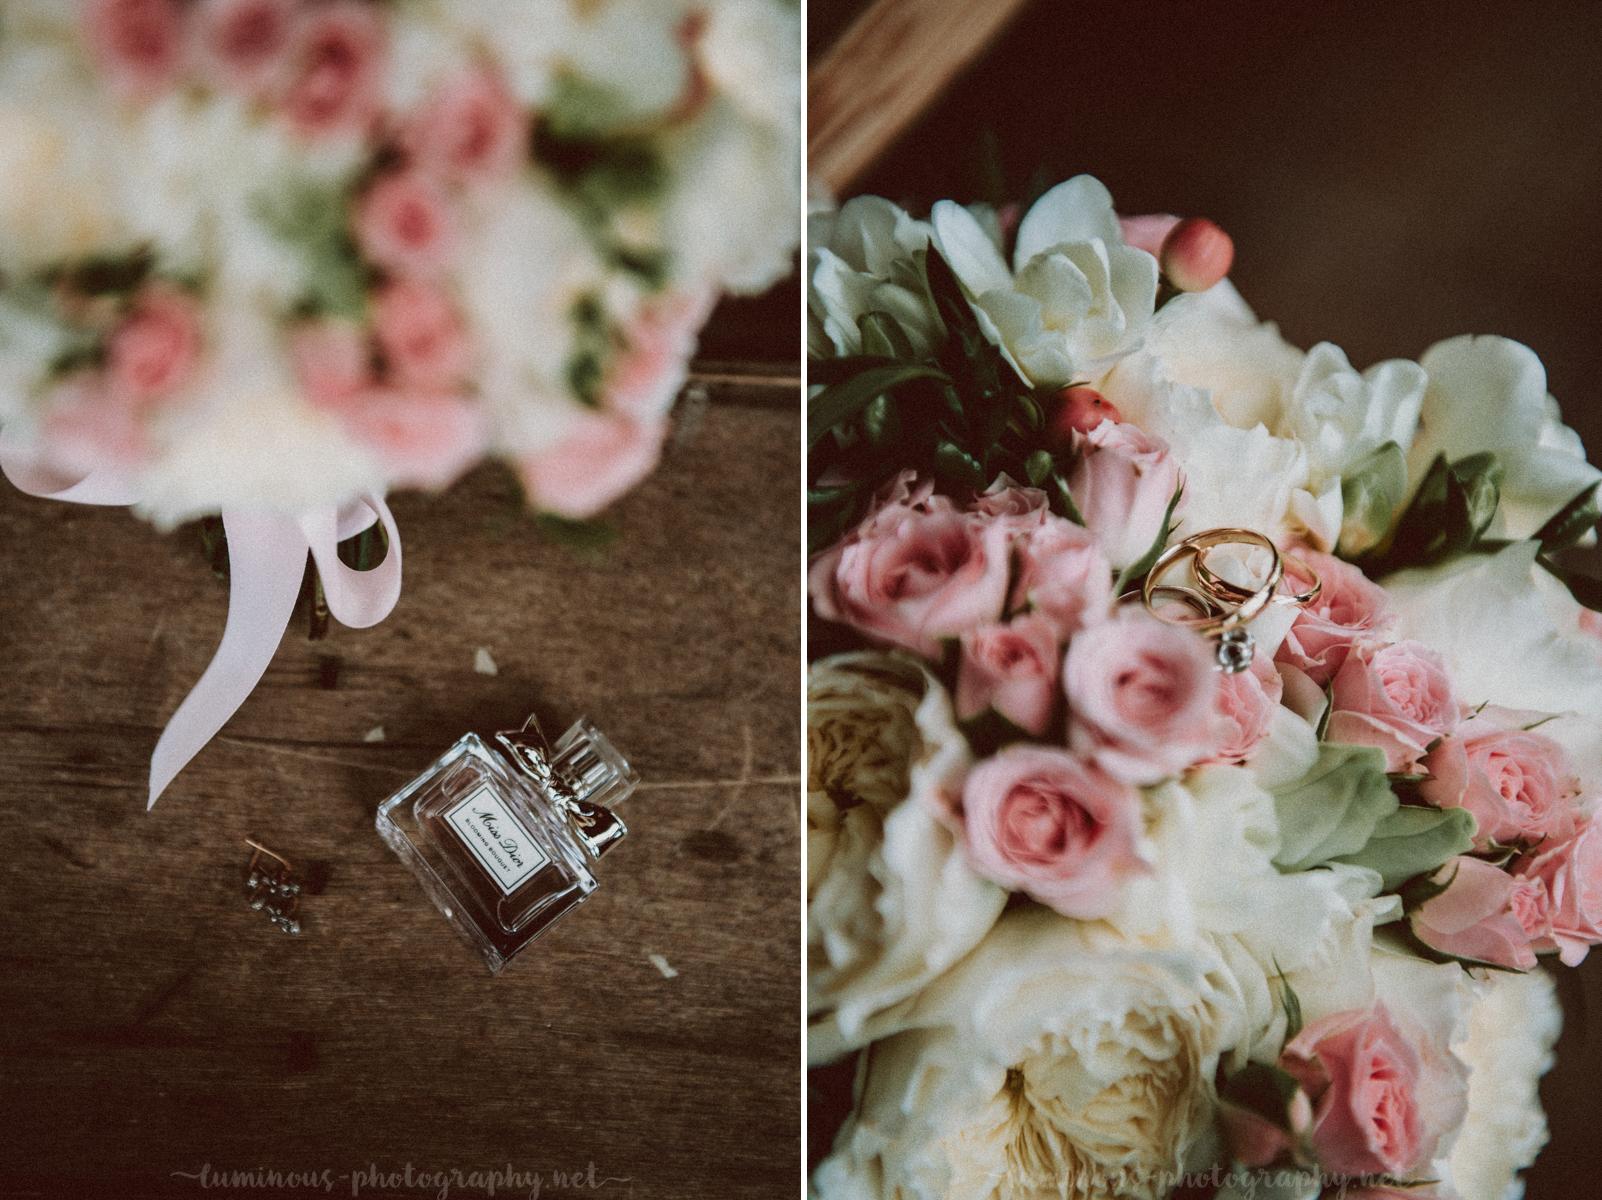 casamento-wedding-luminous-photography-porto-karolina-pedro-298.jpg